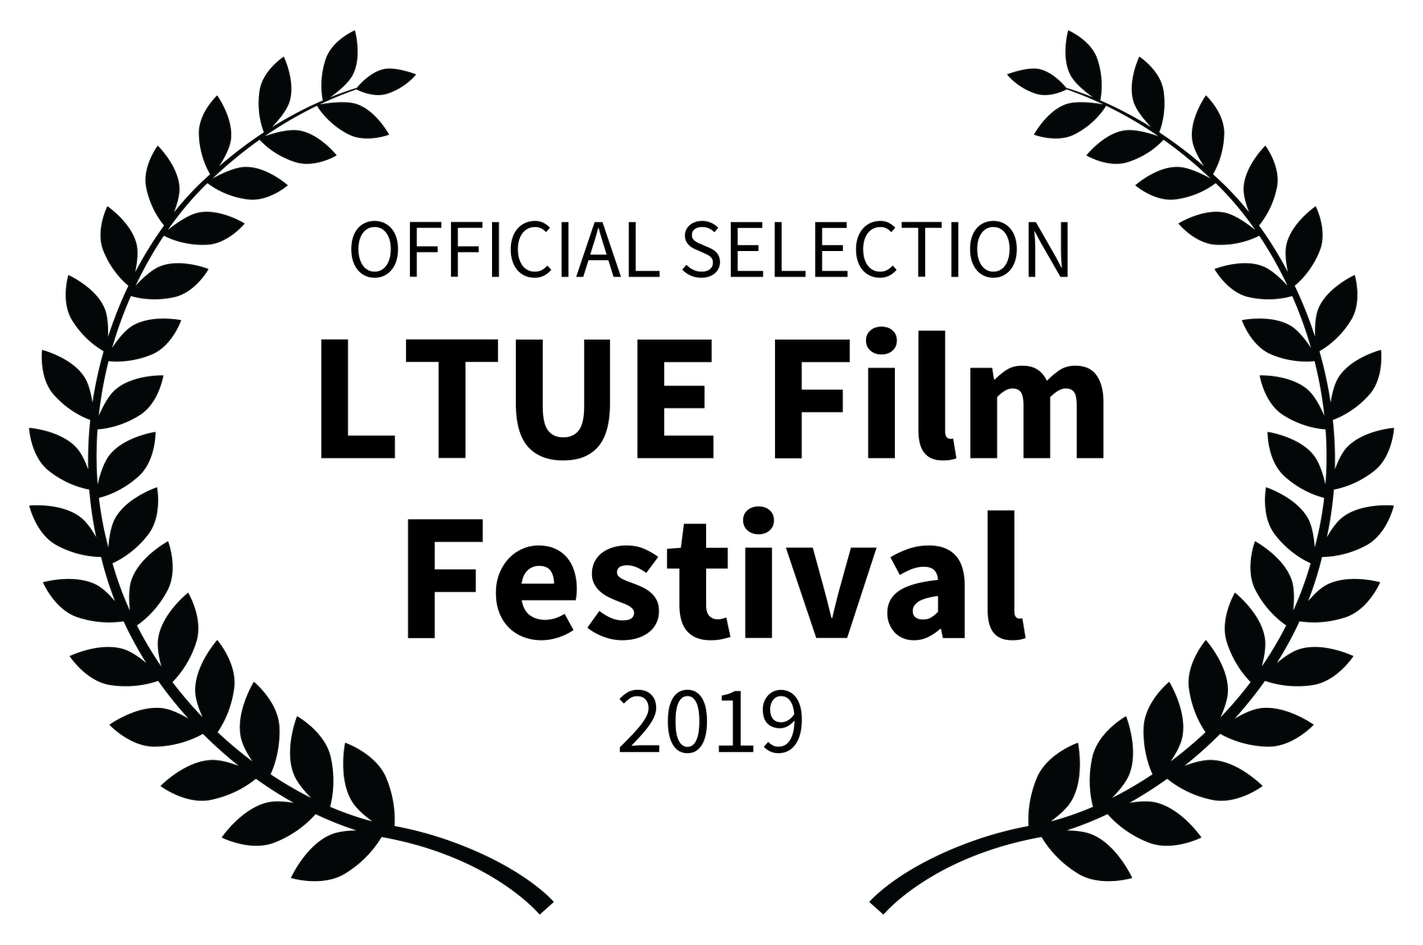 OFFICIAL SELECTION - LTUE Film Festival 2019